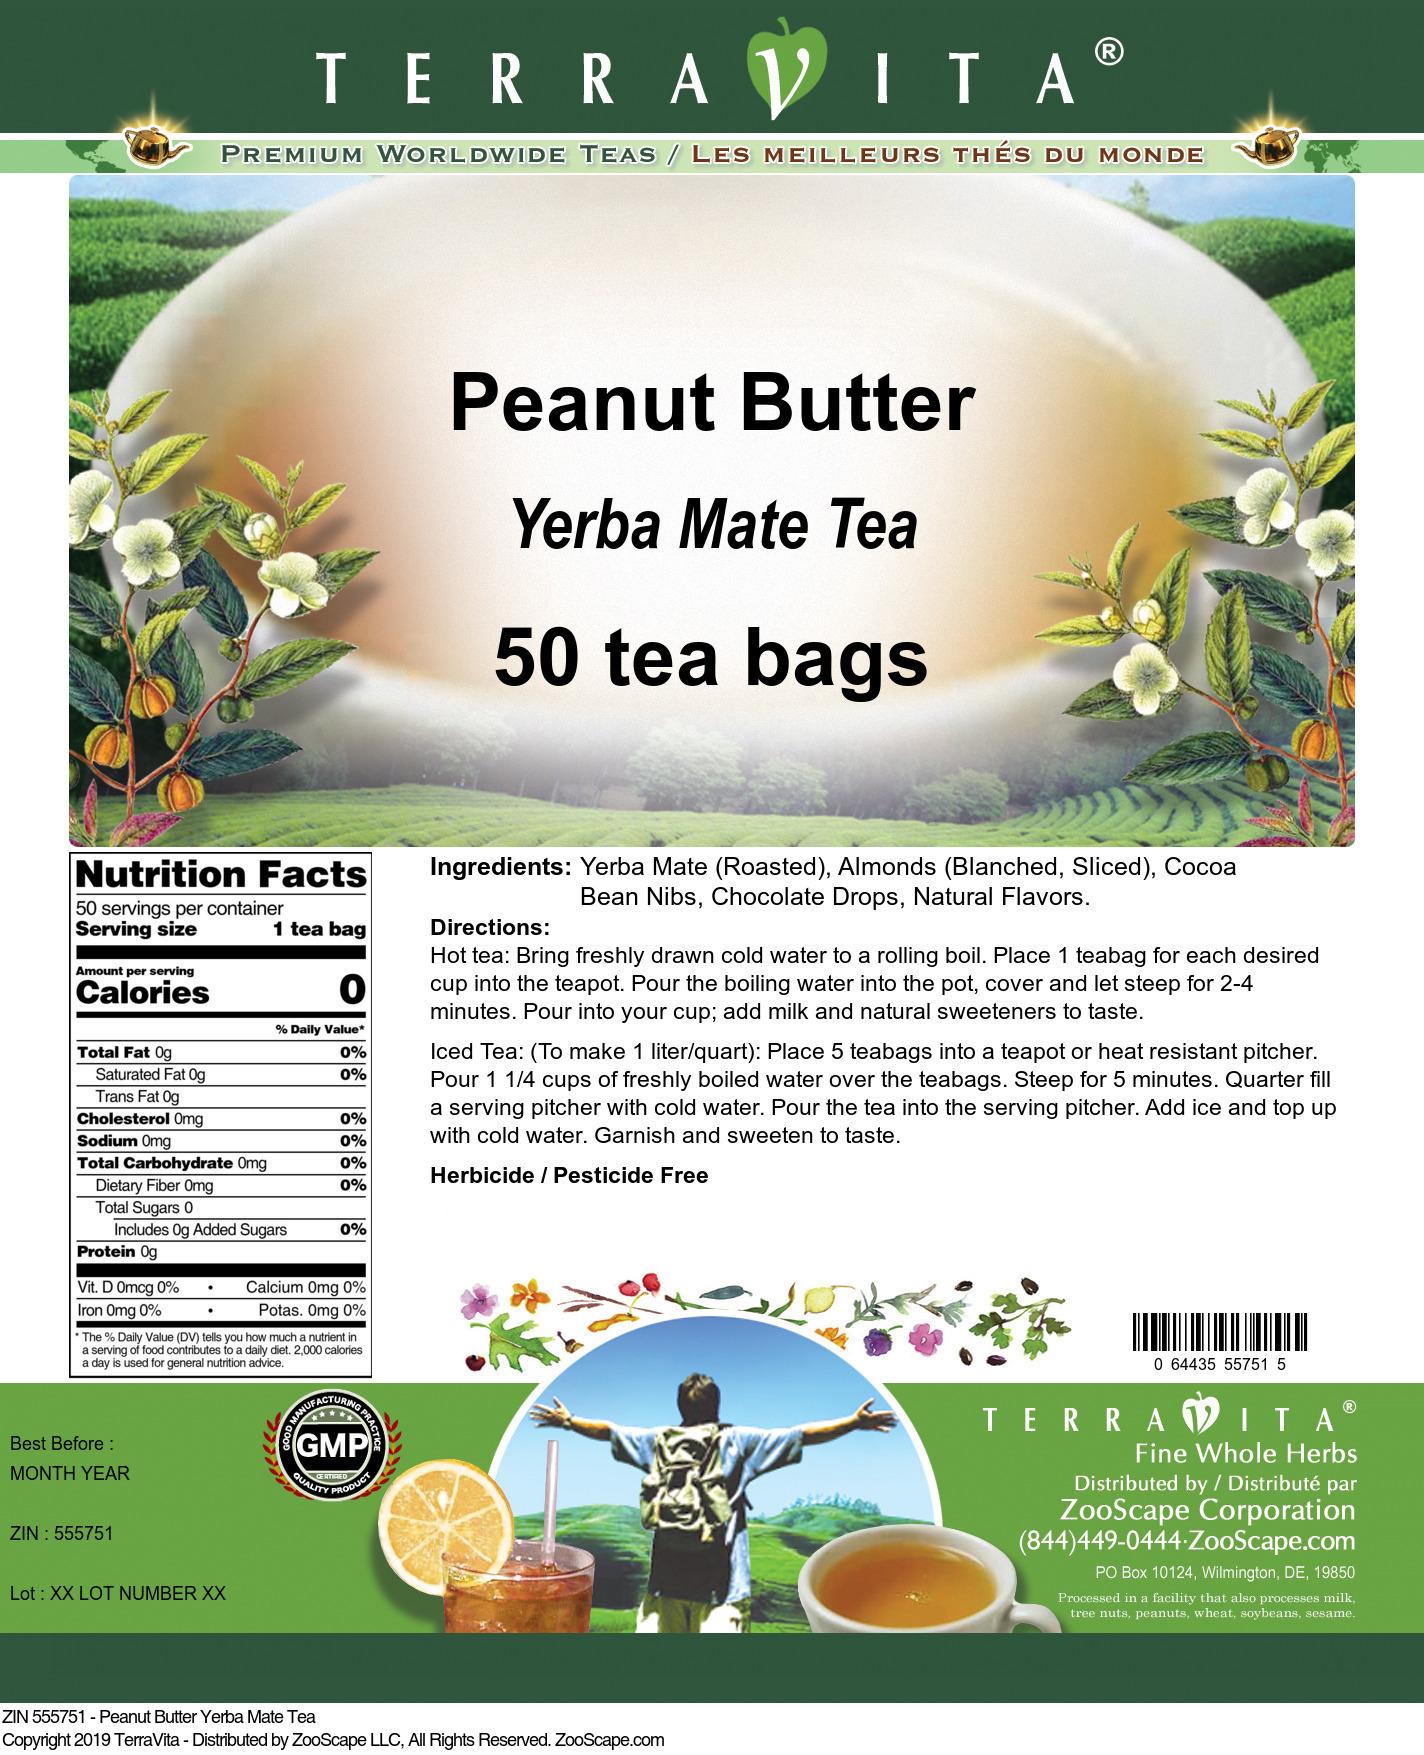 Peanut Butter Yerba Mate